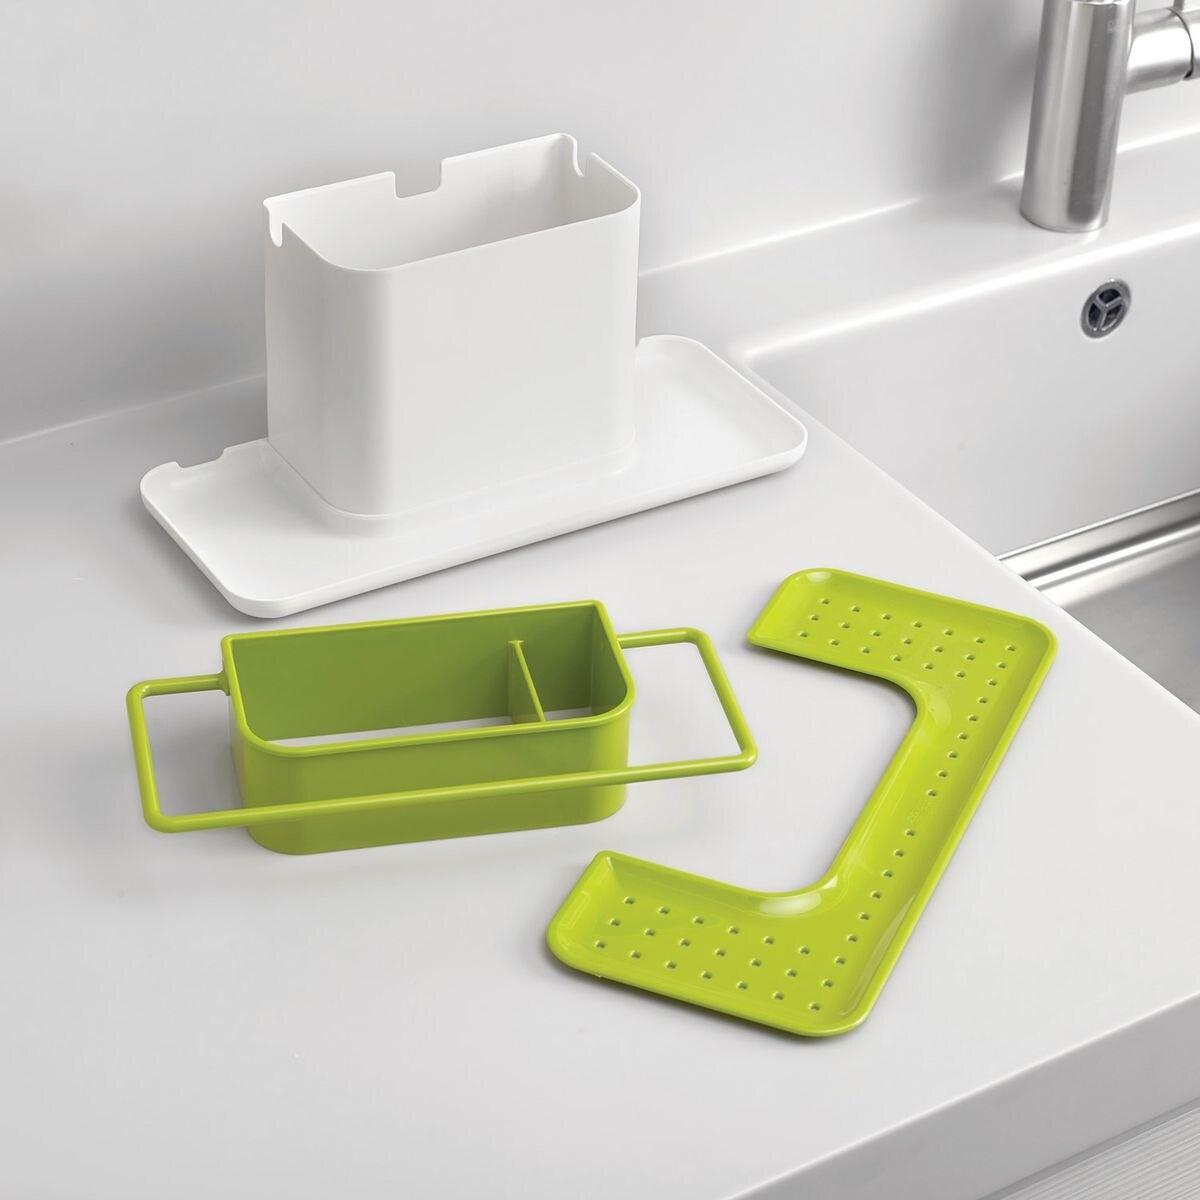 Famous Soap Caddy Photos - Bathtub Design Ideas - valtak.com